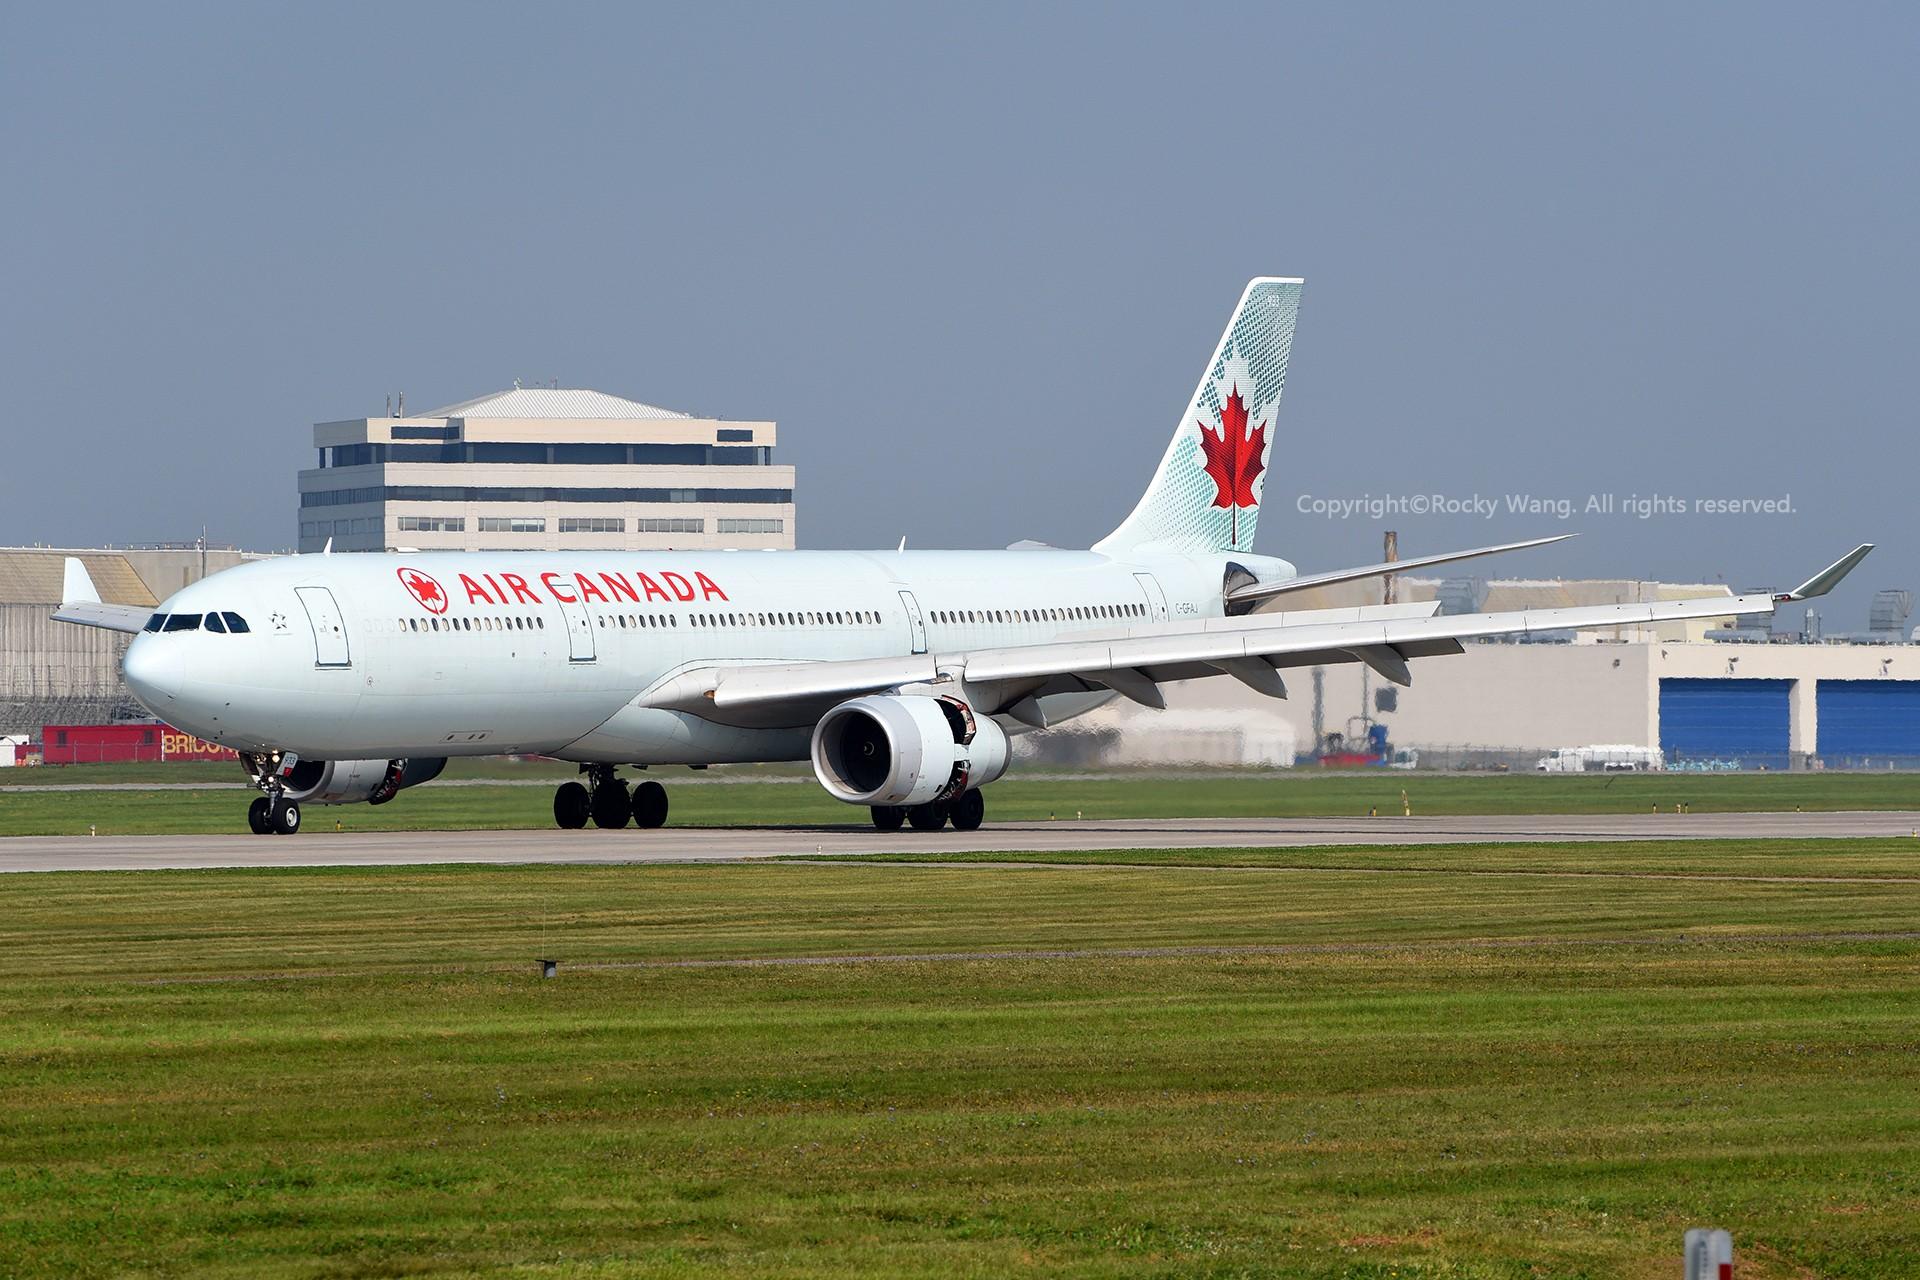 Re:[原创]A330s Around the World AIRBUS A330-343 C-GFAJ 加拿大蒙特利尔特鲁多机场